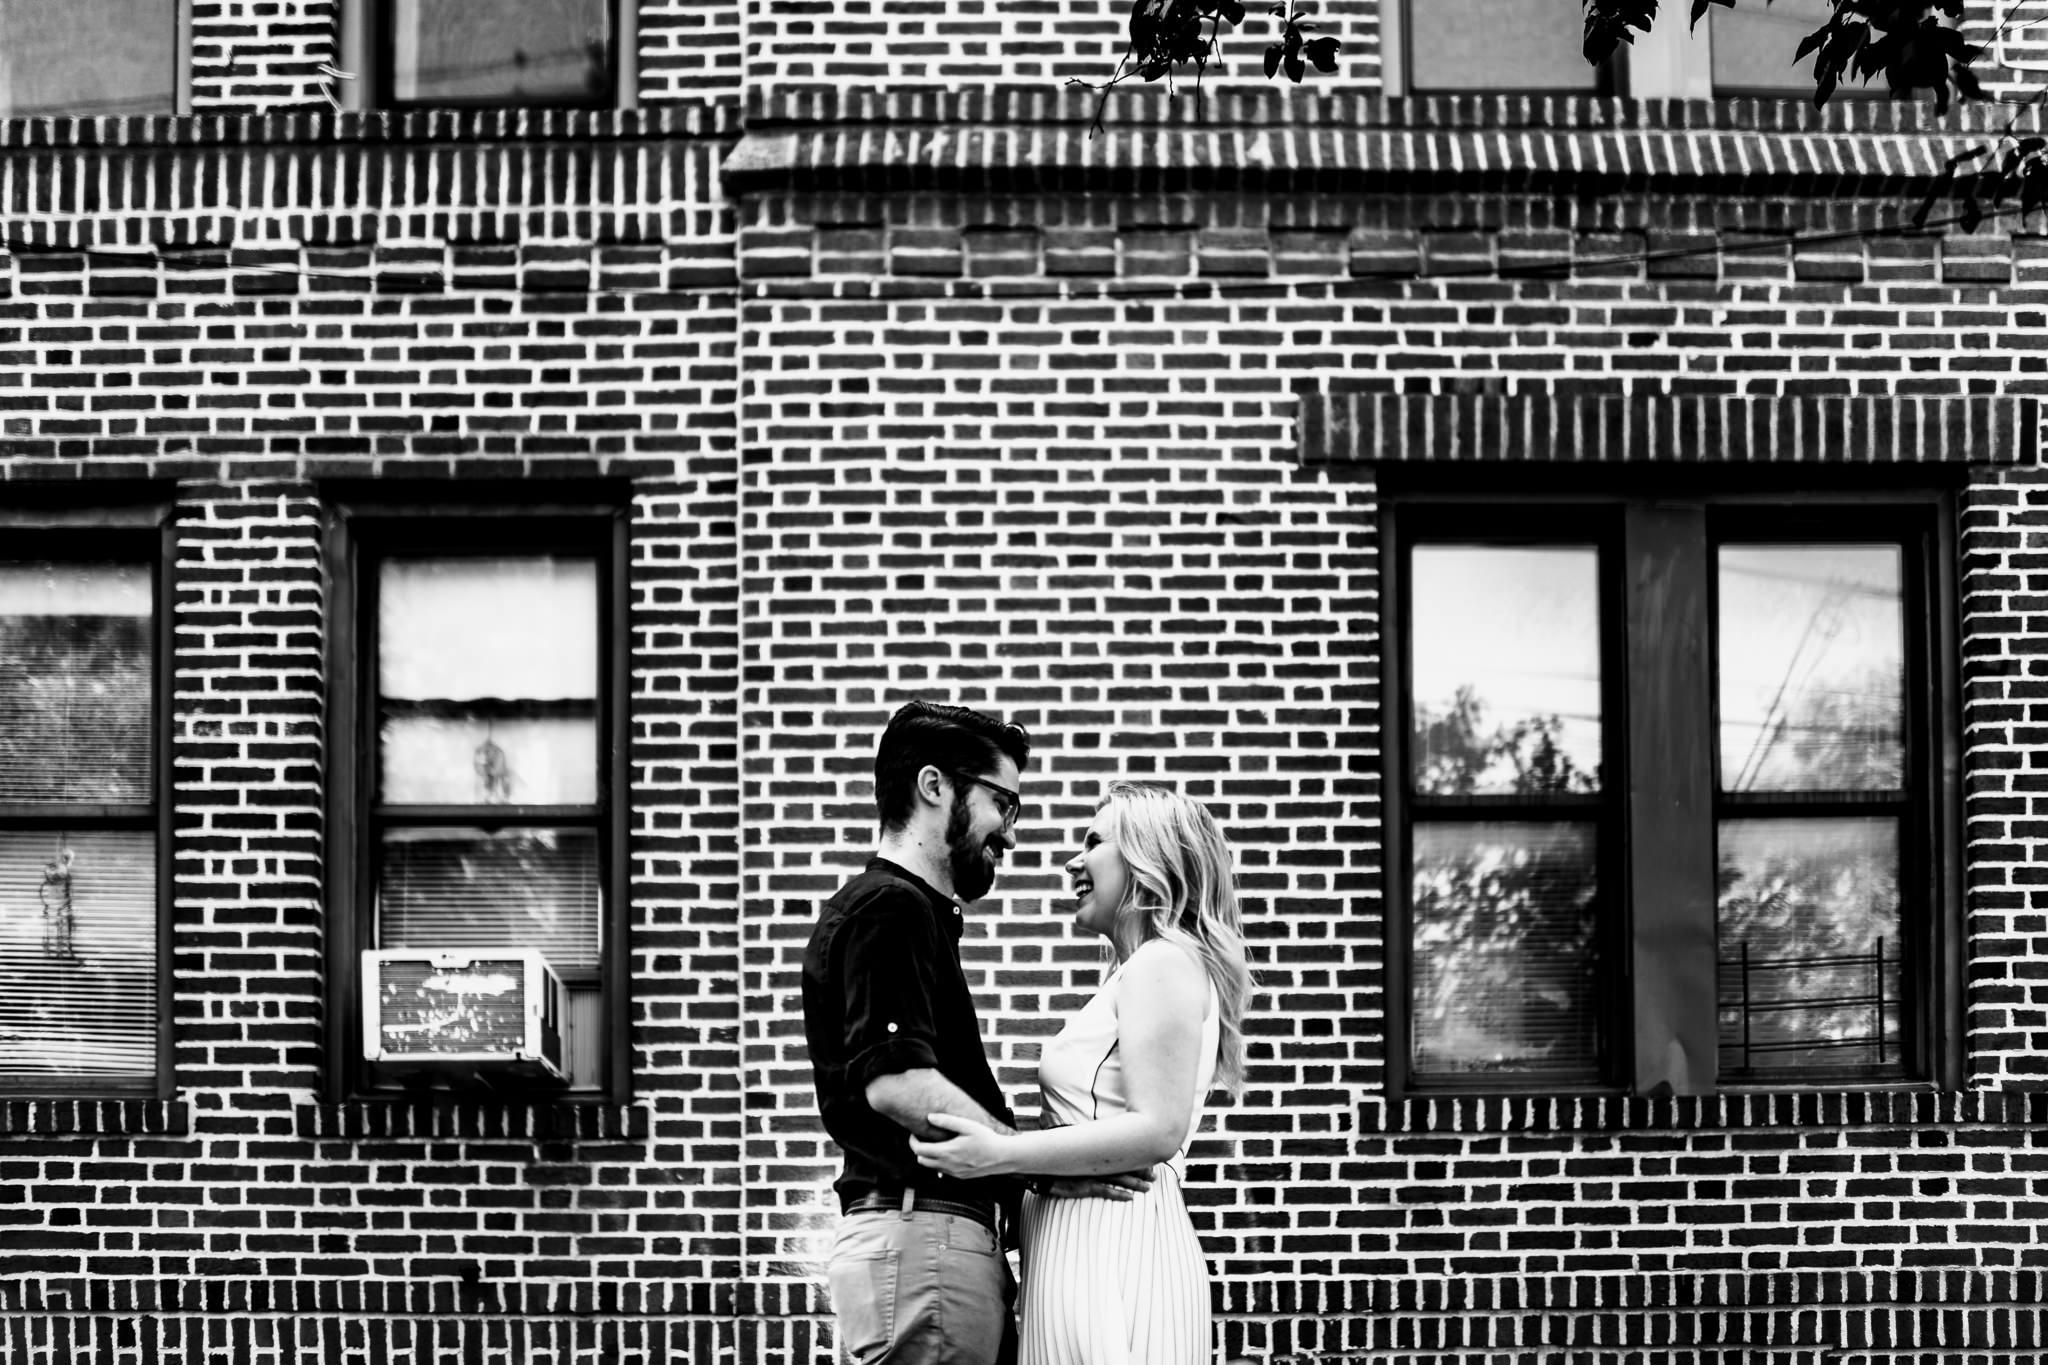 Arena-Brooklyn-New-York-Engagement-Photos-14.jpg